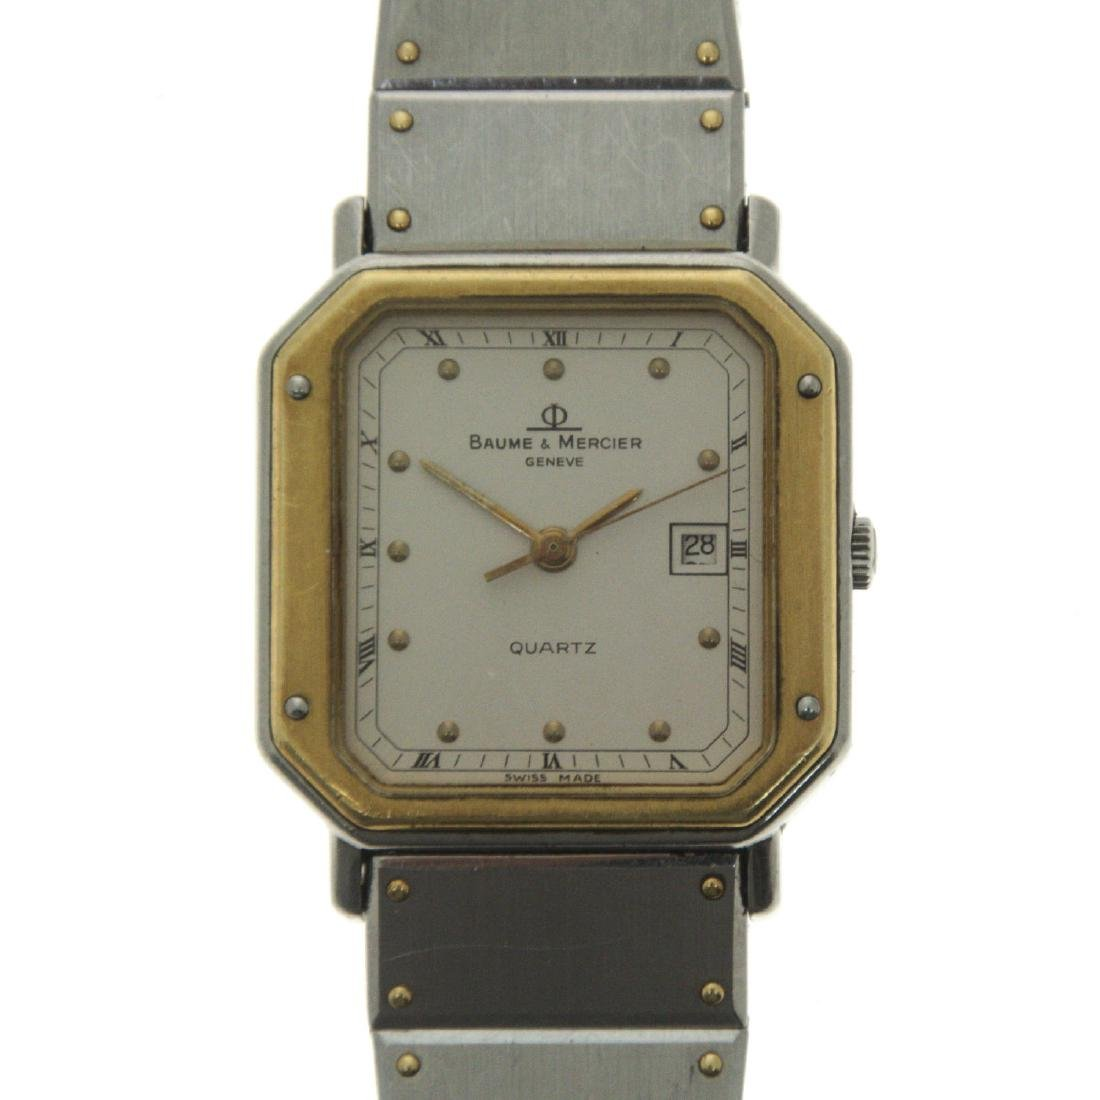 Baume & Mercier Wrist Watch.